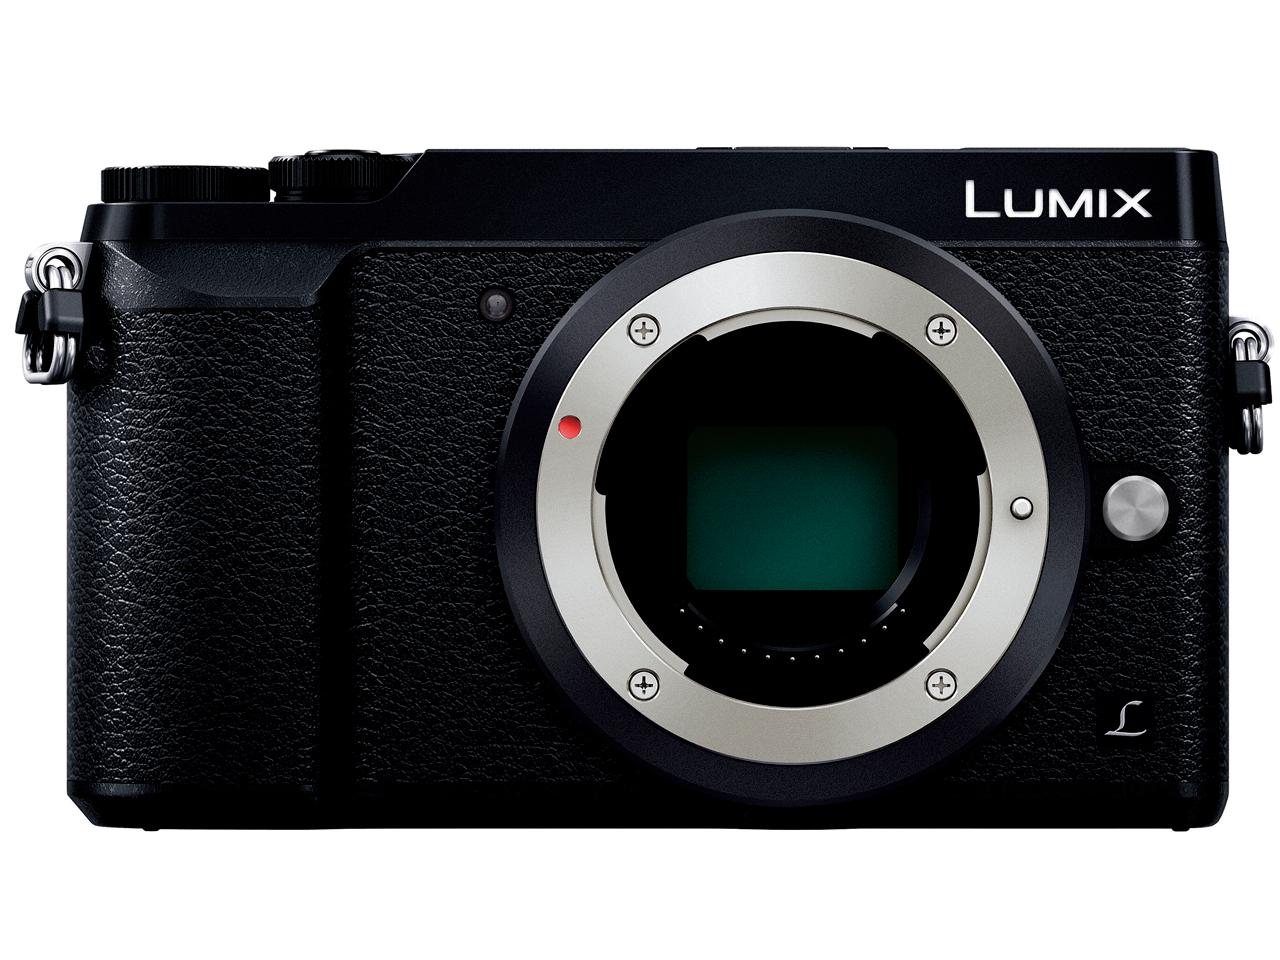 LUMIX DMC-GX7MK2-K ボディ [ブラック] の製品画像